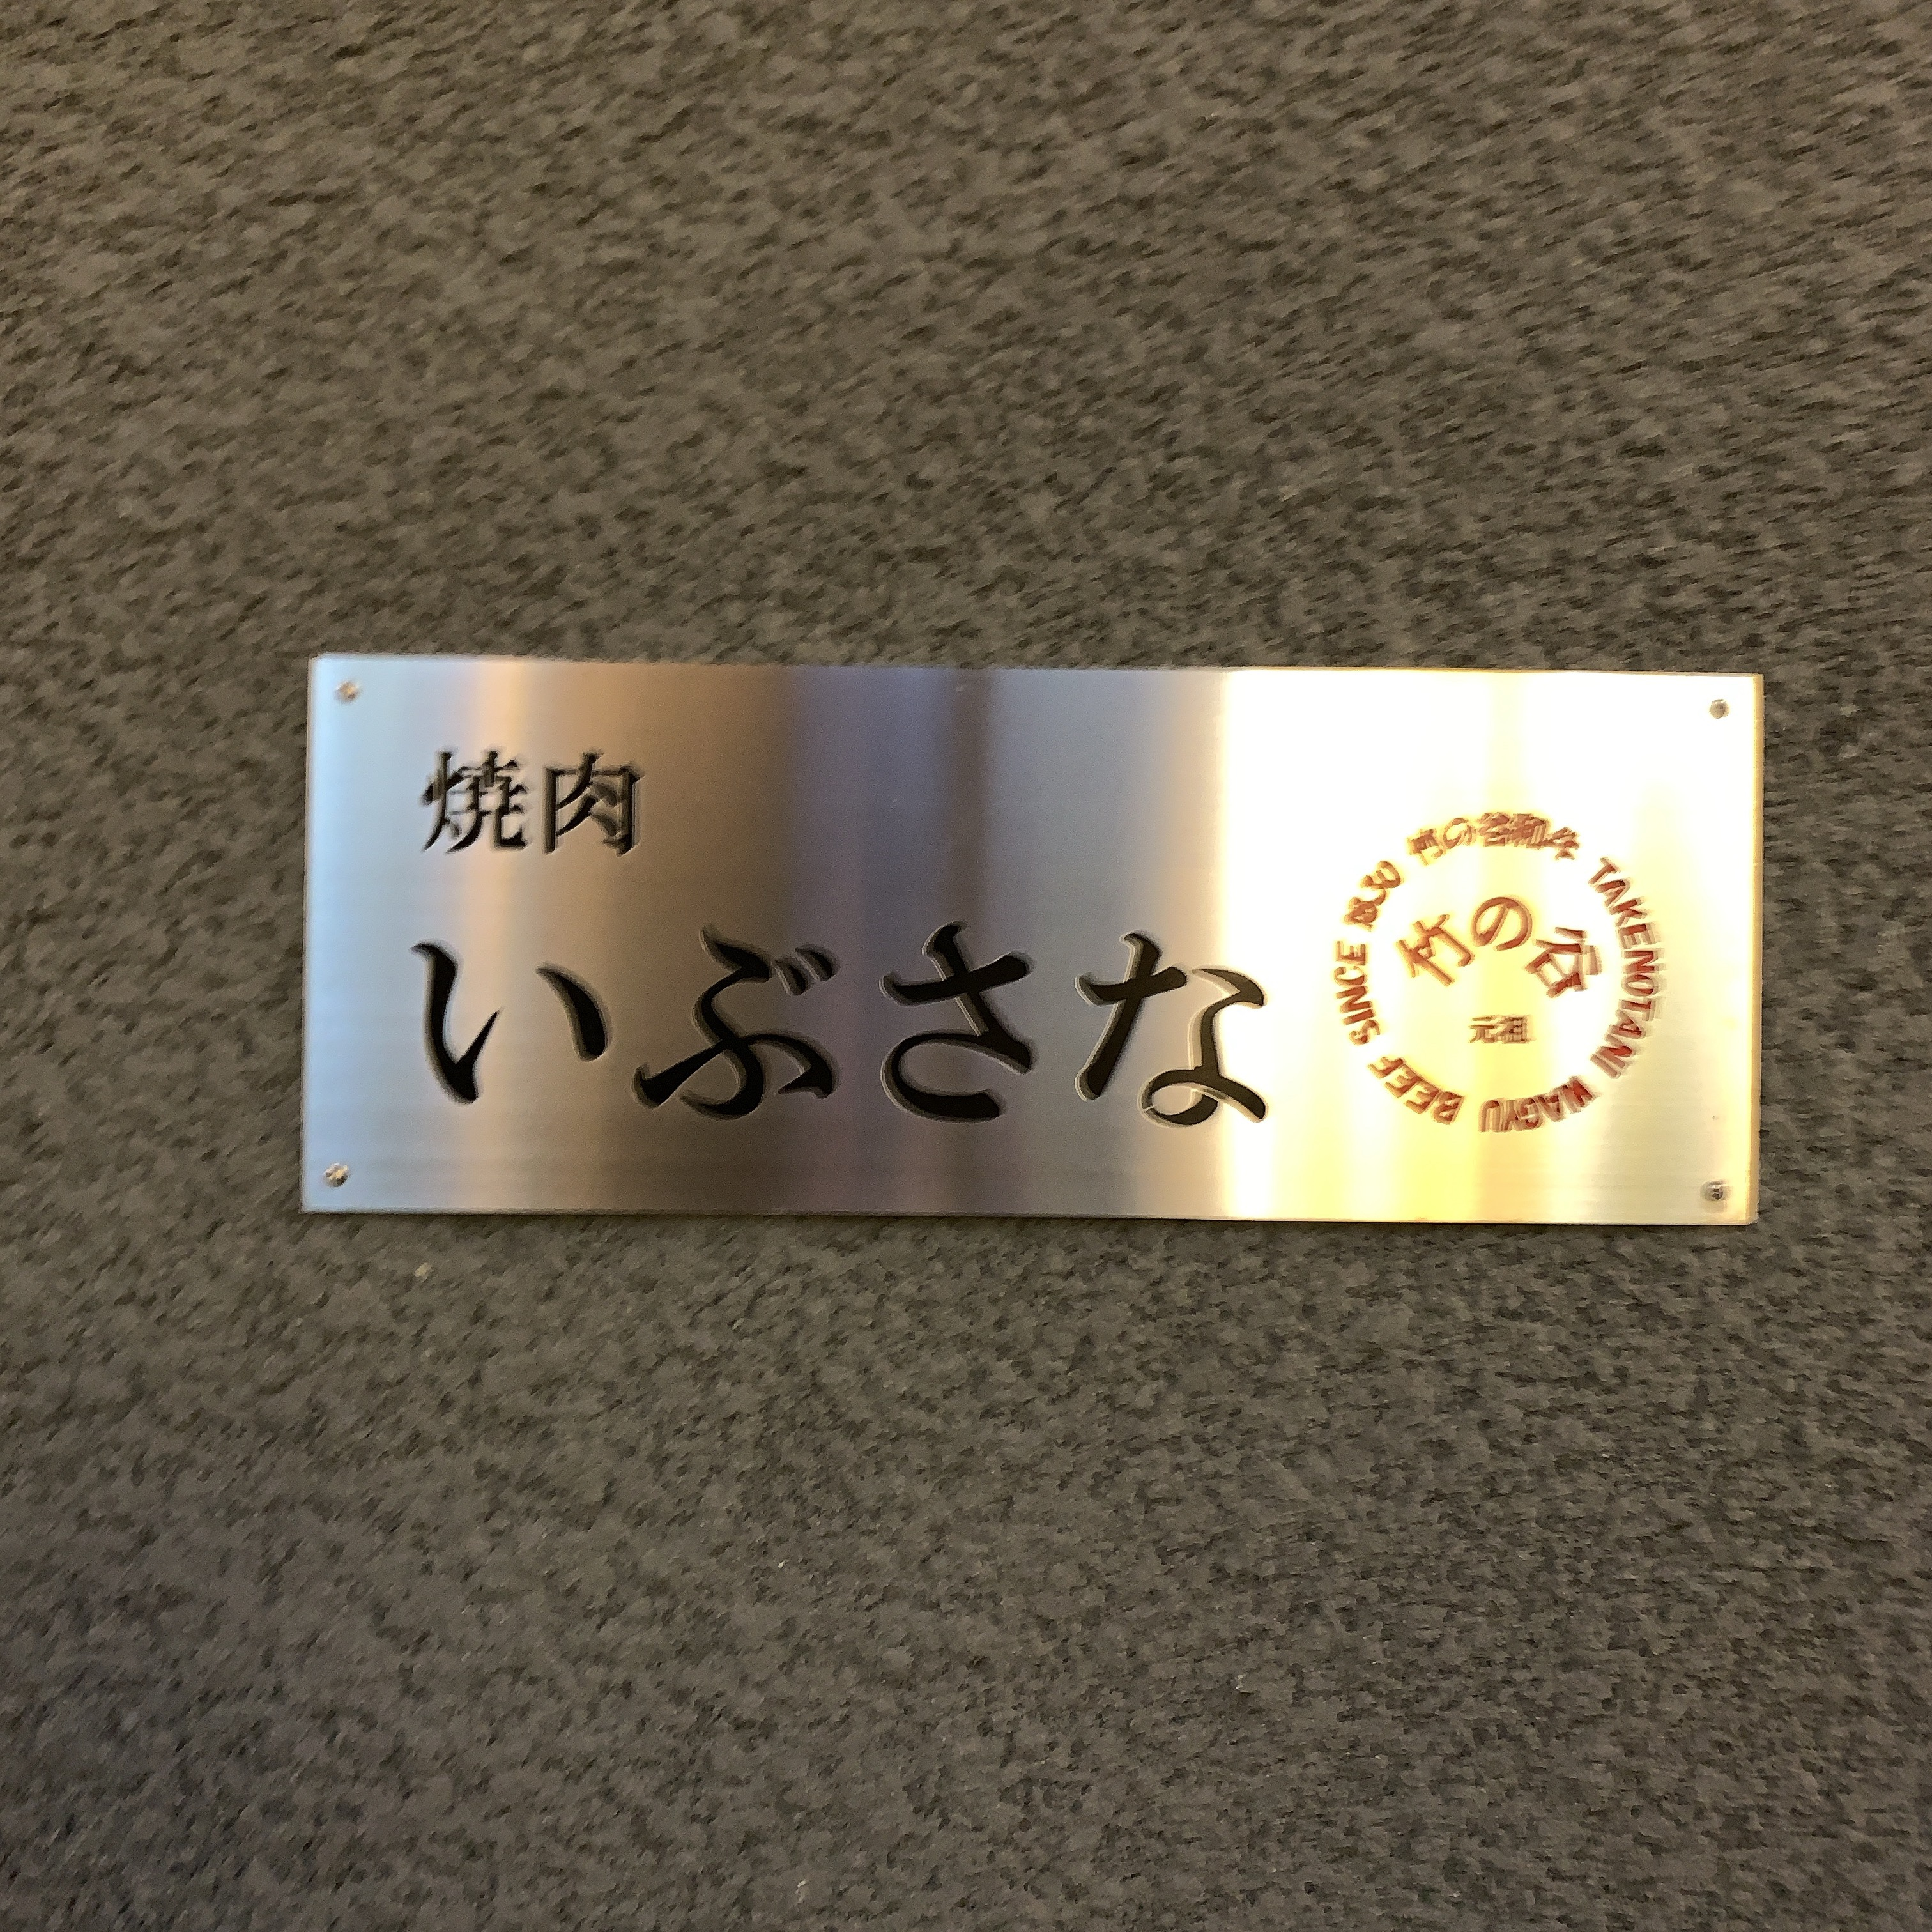 img 2843 - 完全紹介制焼肉店「いぶさな」に行ってきました